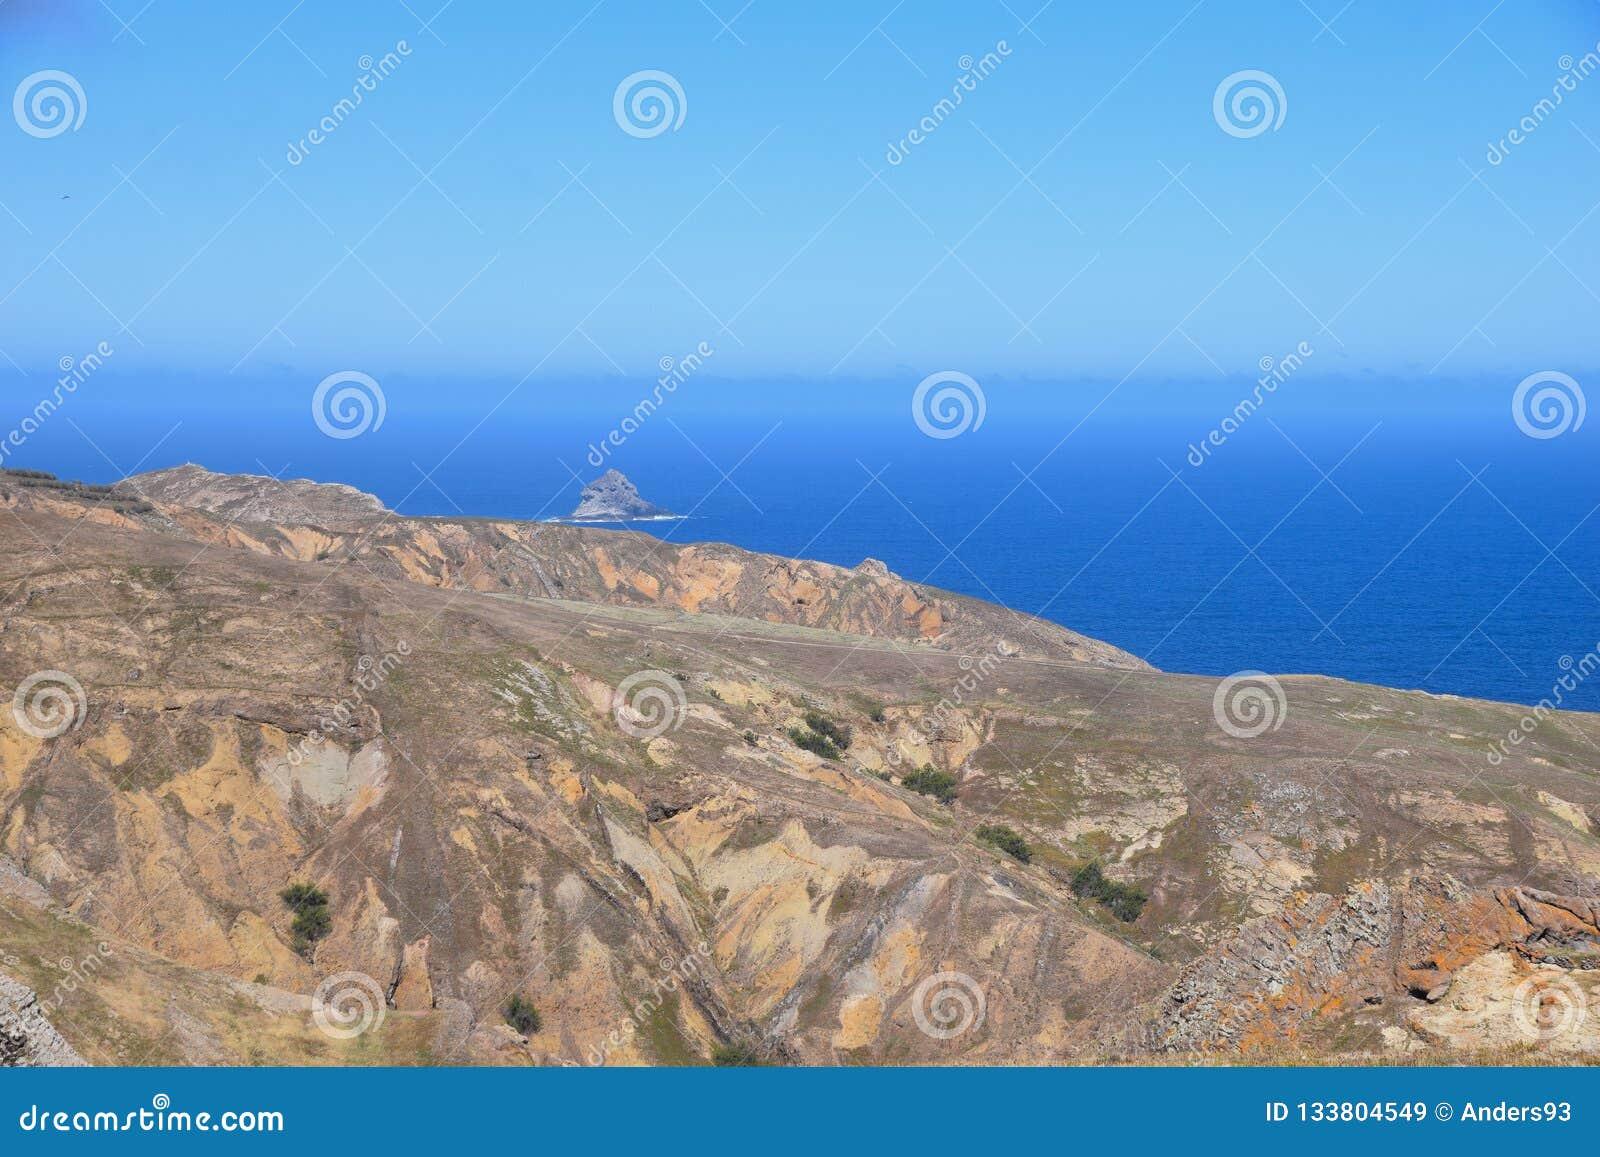 The northern coast near Camacha in Porto Santo, Madeira, Portugal